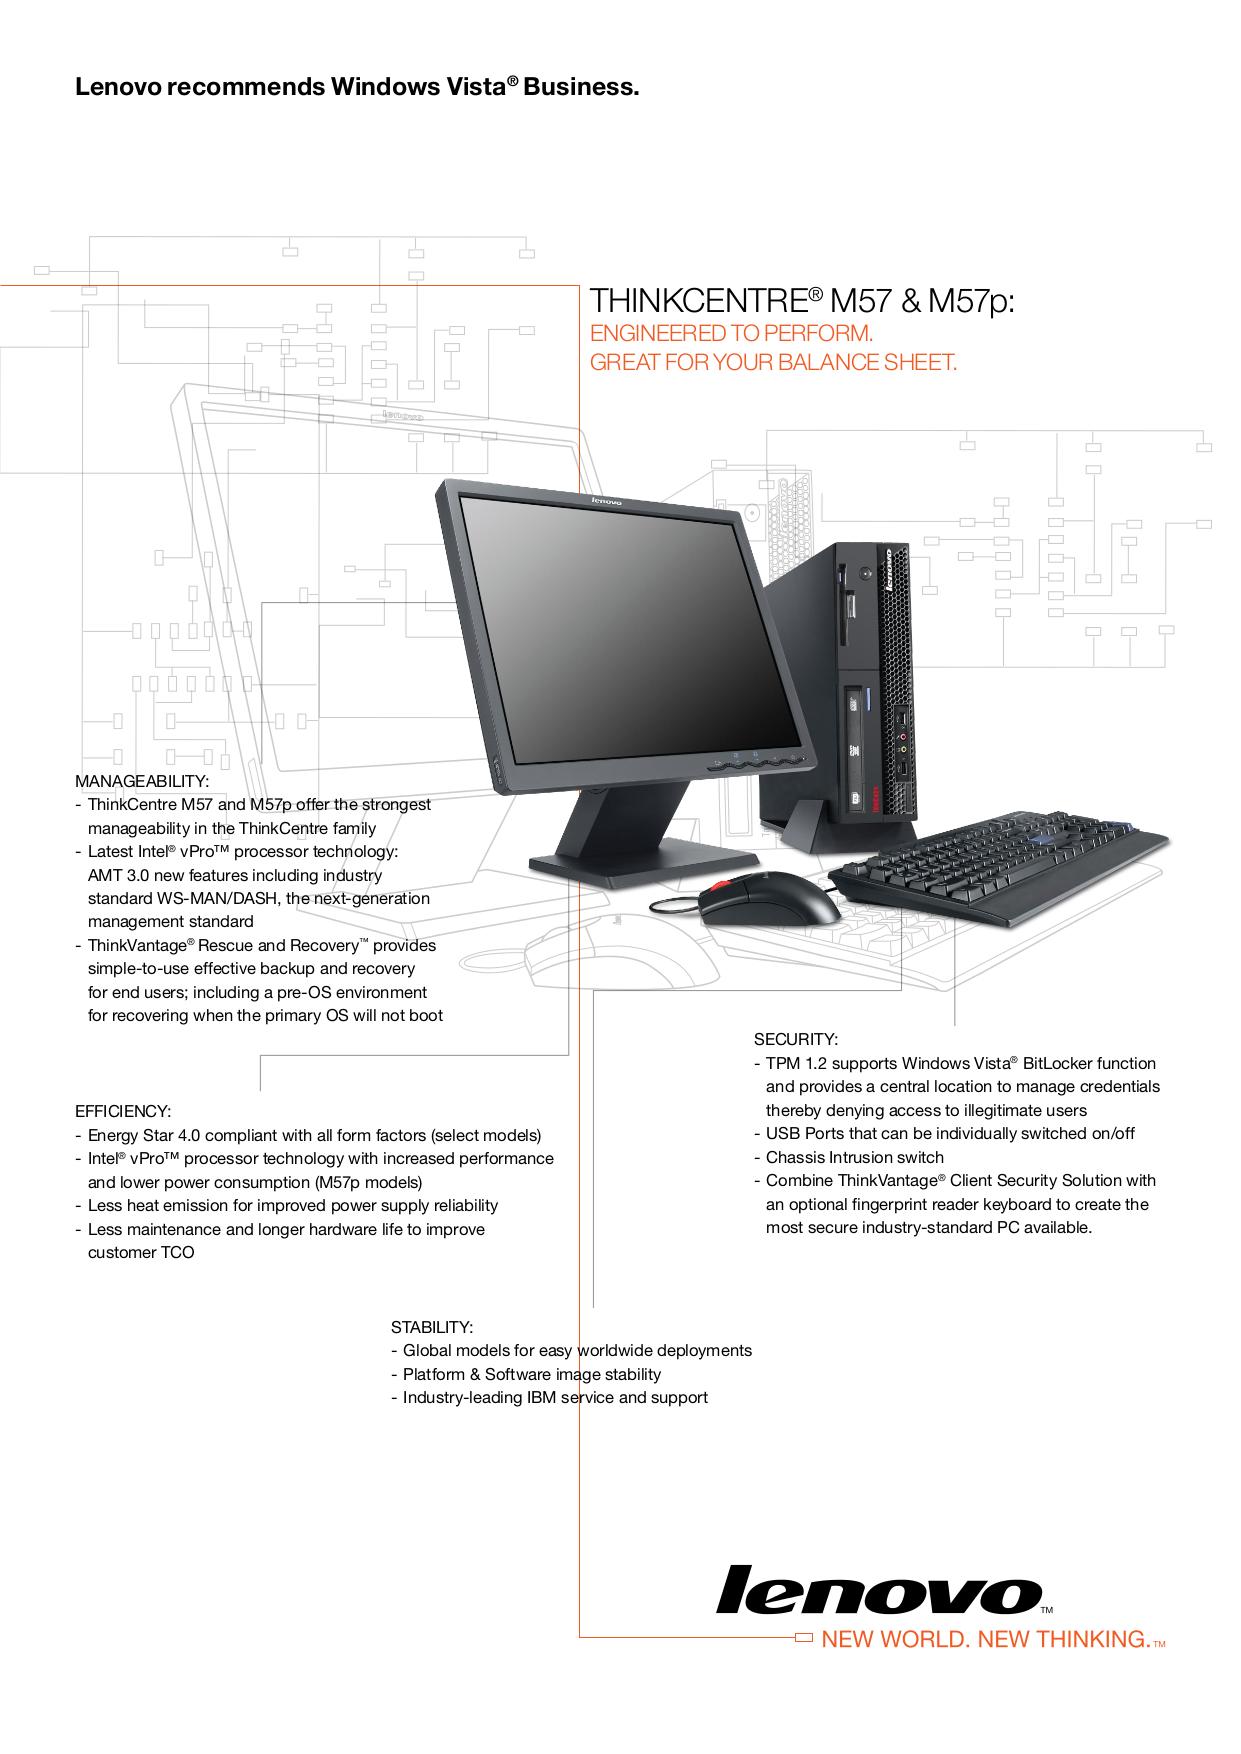 pdf for Lenovo Desktop ThinkCentre M57p 9087 manual